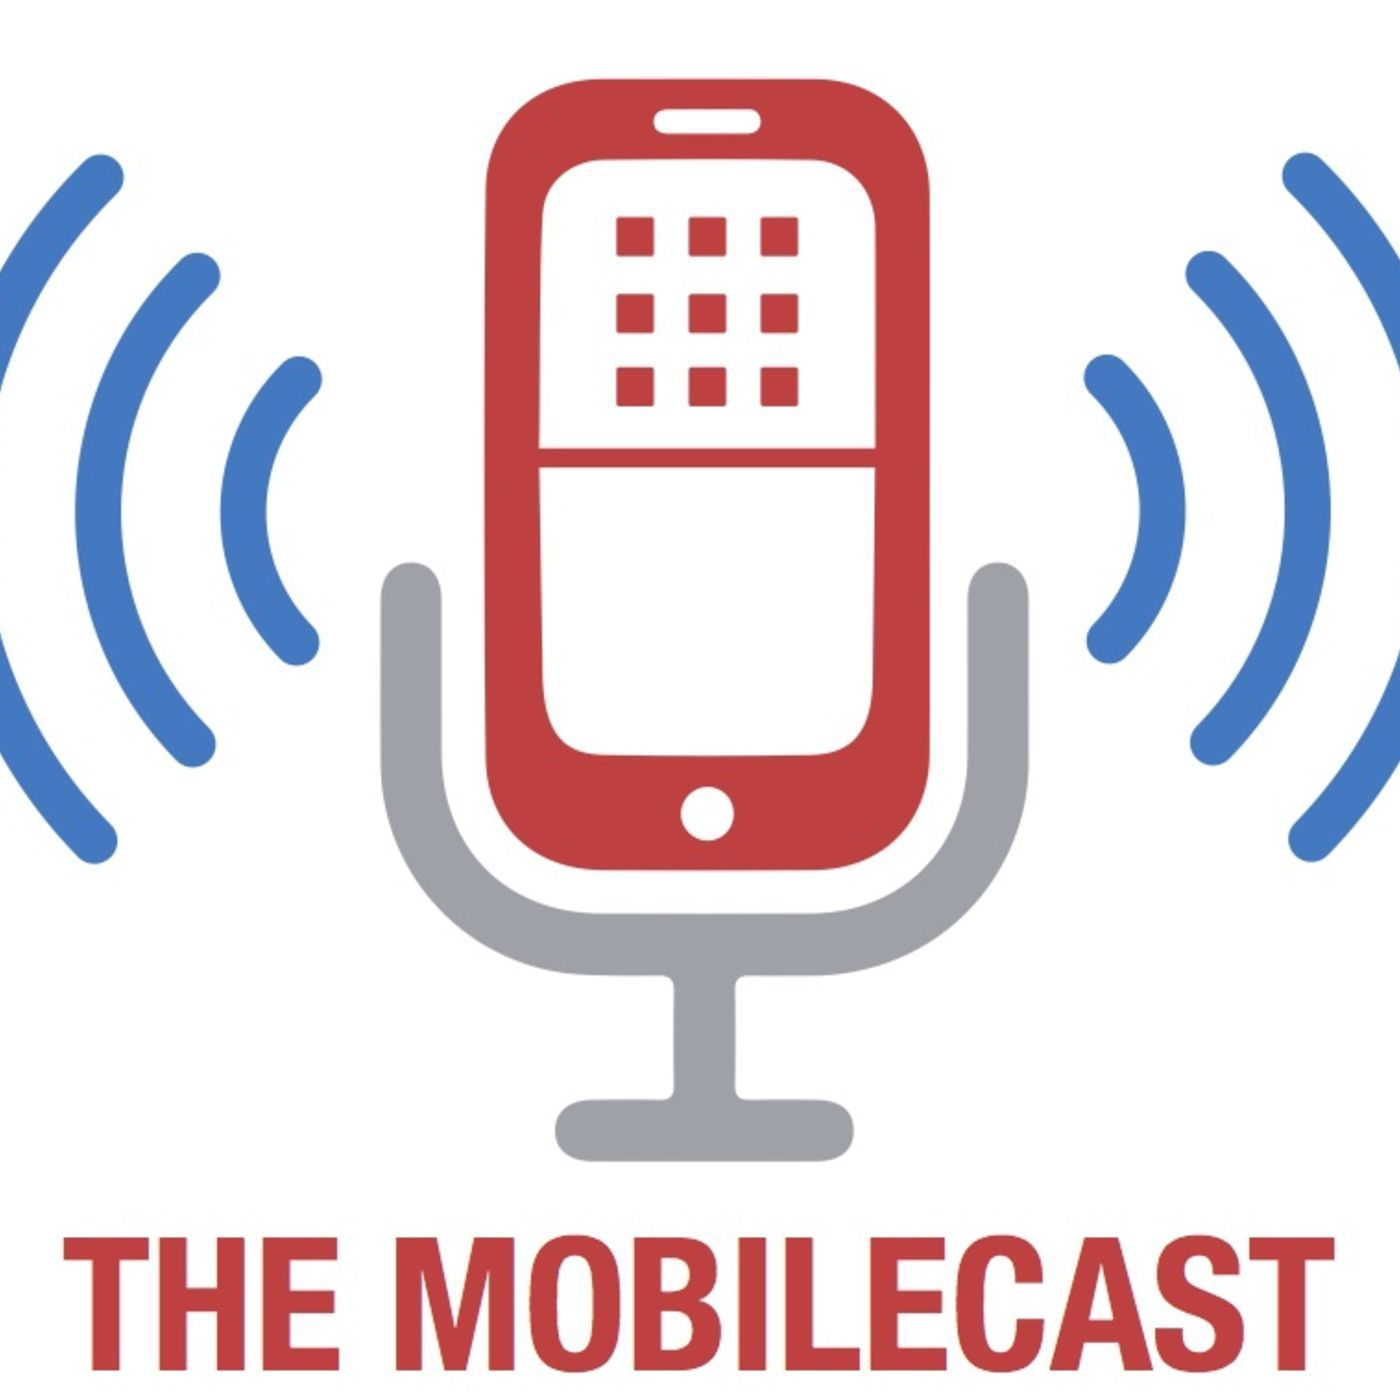 The Mobilecast #303 – S3 Ep3 MWC 2016 Day 1 recap with Sascha Segan